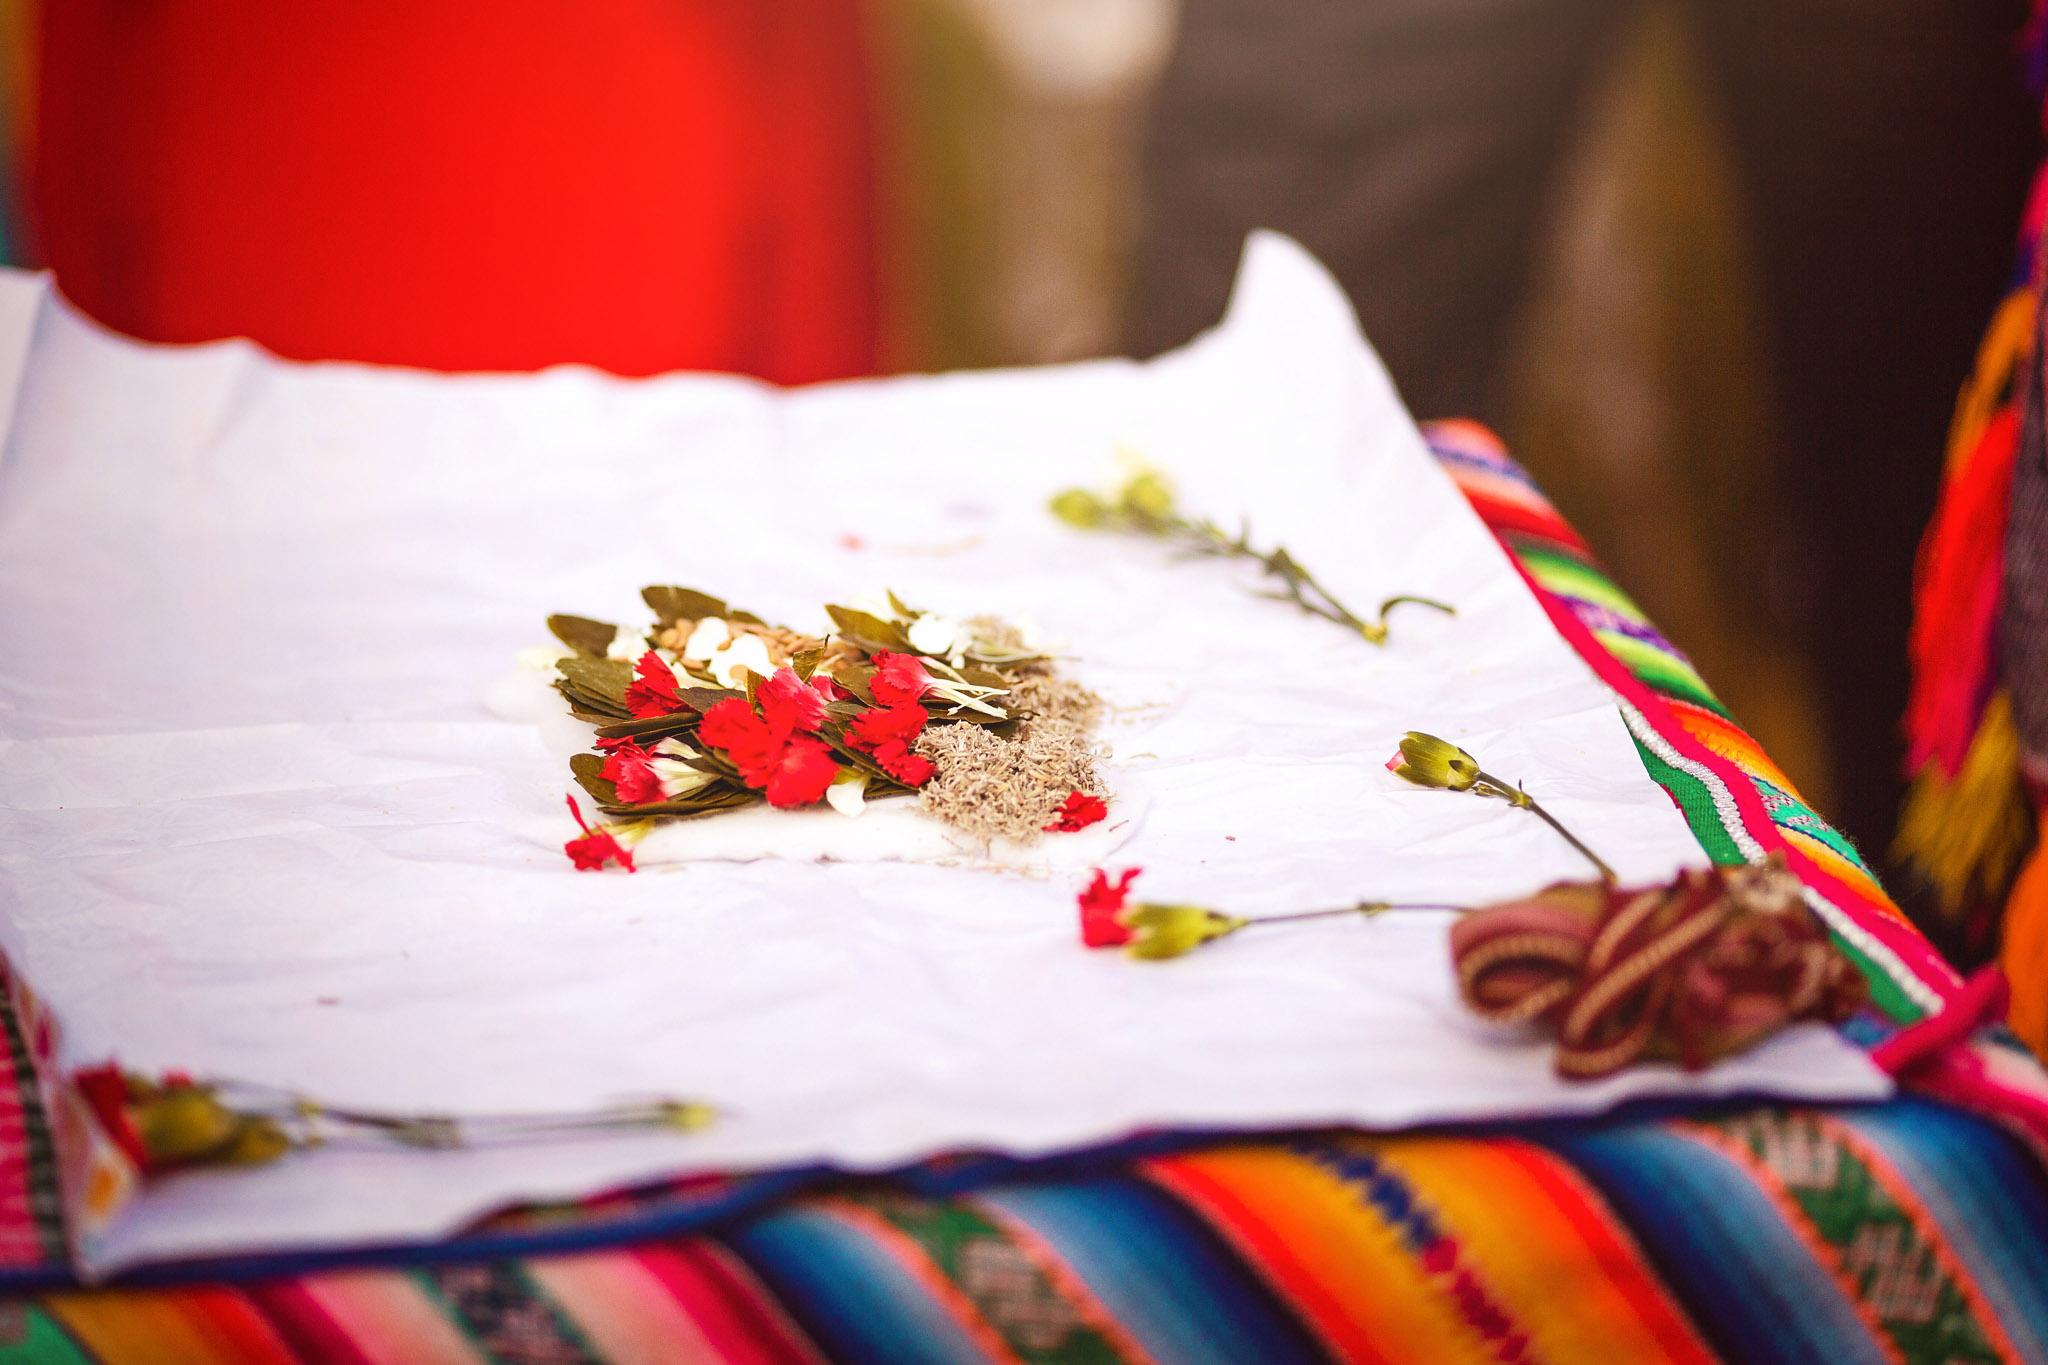 Wedding-Travellers-Destination-Wedding-Peru-Cusco-Hacienda-Sarapampa-Sacred-Valley-traditional-andean-ceremony-despacho-red-white-flower